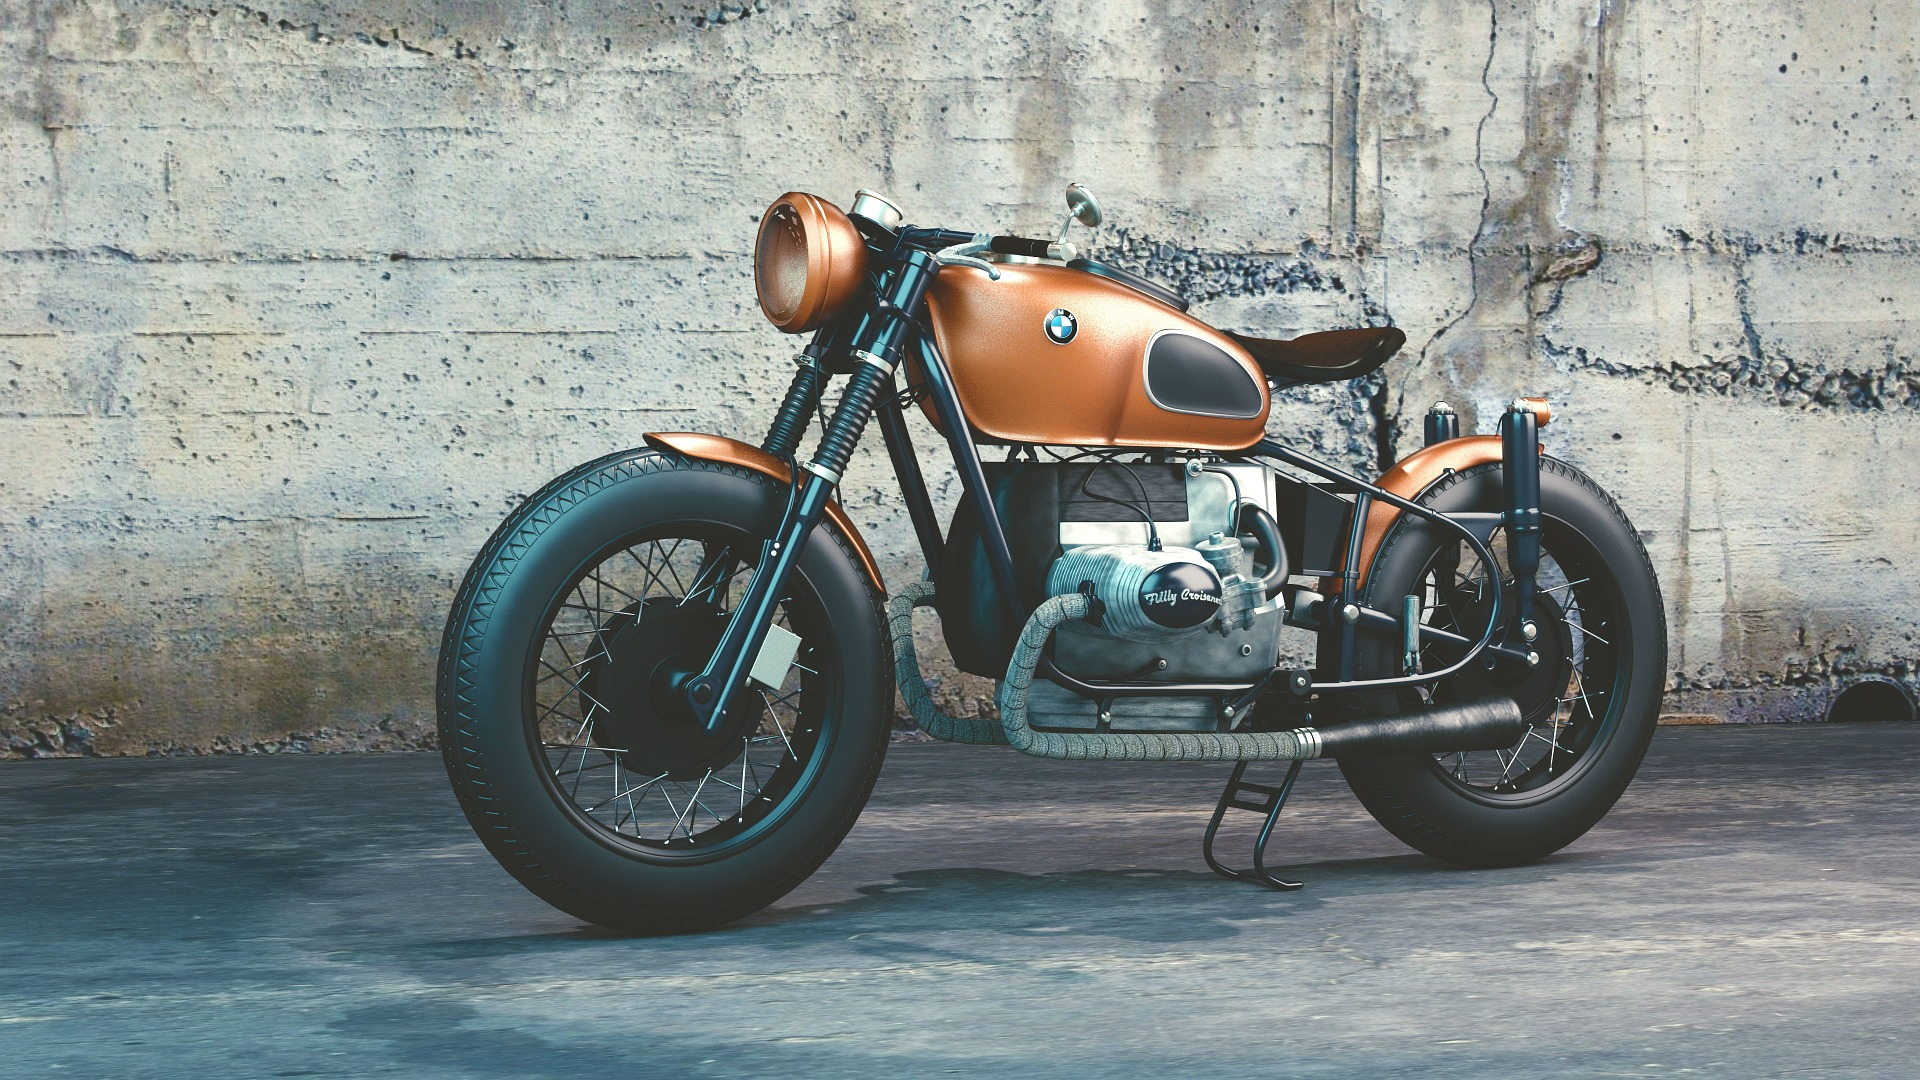 moto, BMW, motore, rischio, Avventura - Sfondi HD - Professor-falken.com